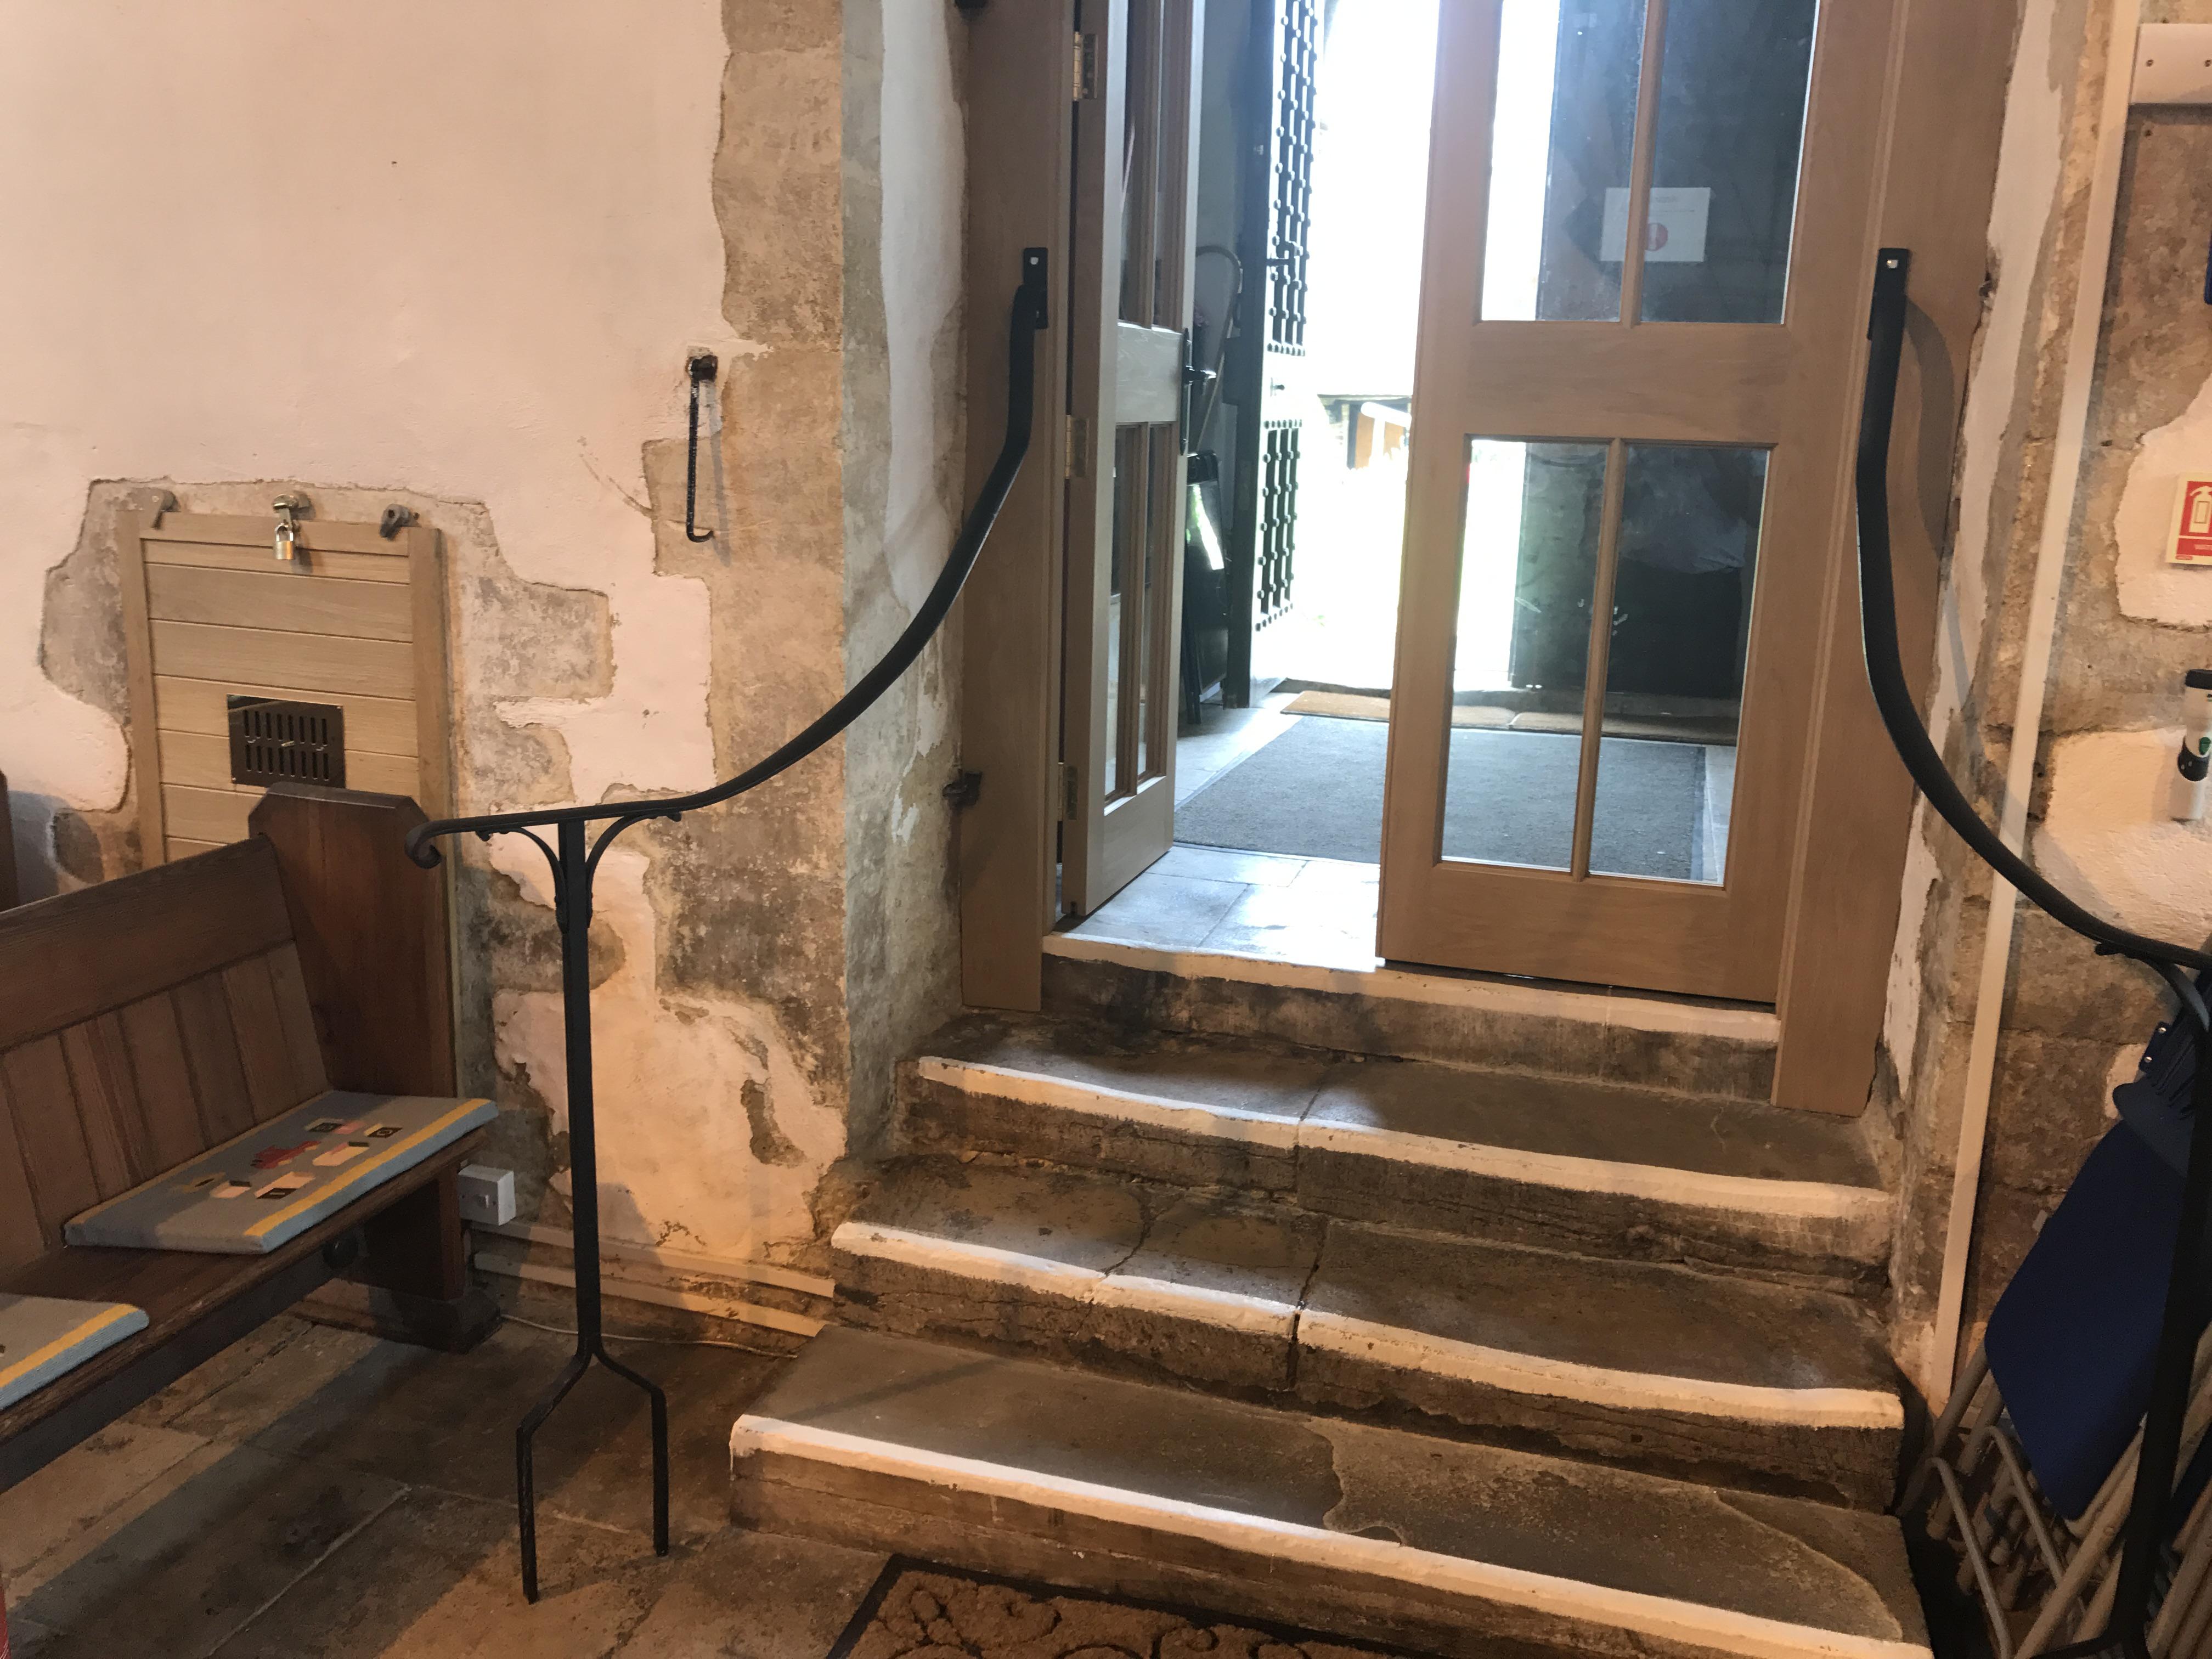 The handrails made by F C Harriss of Sturt Farm Burford